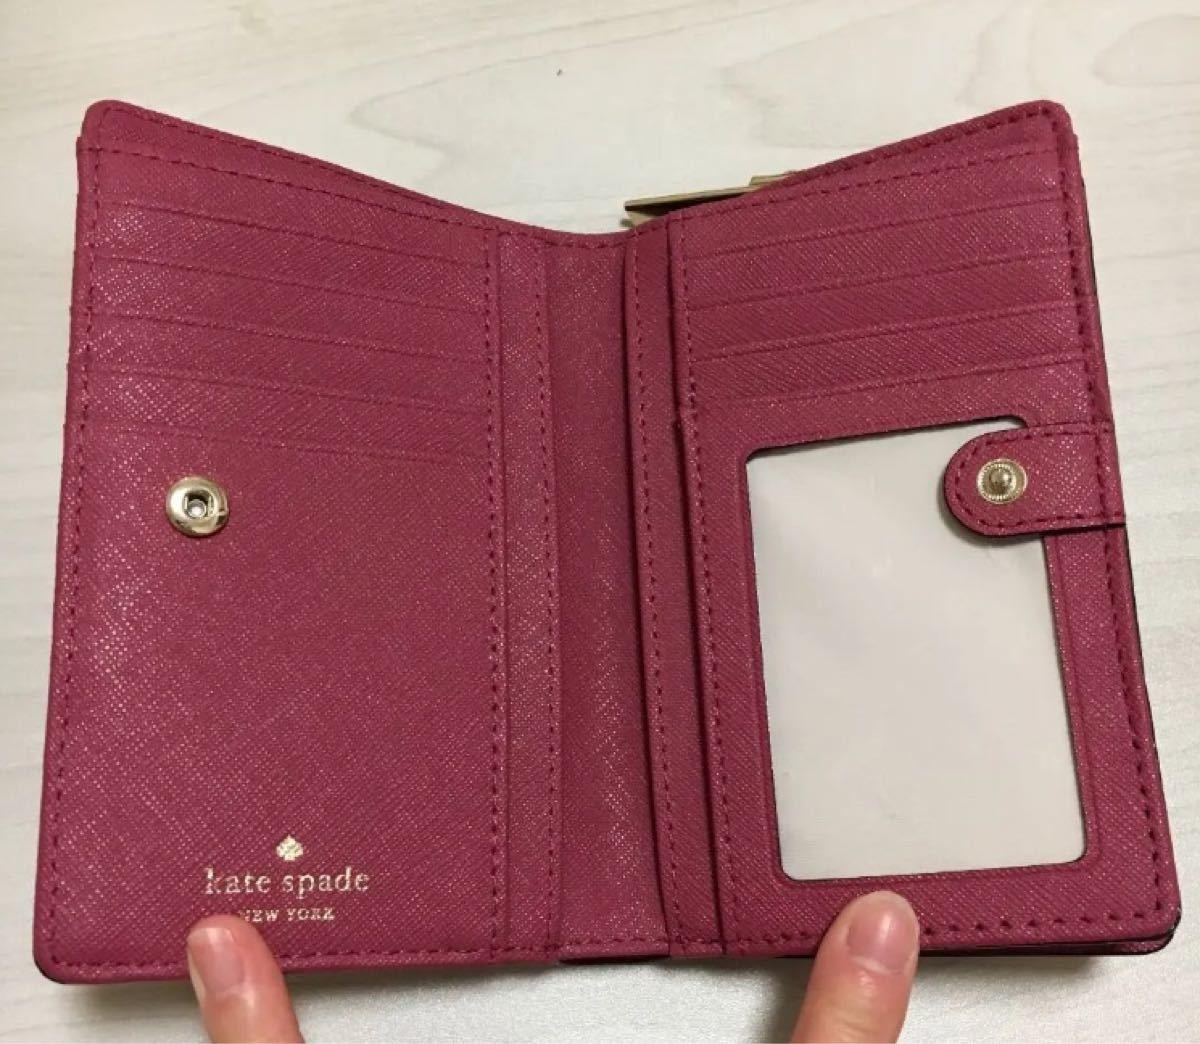 kate spade ケイトスペード 二つ折り財布